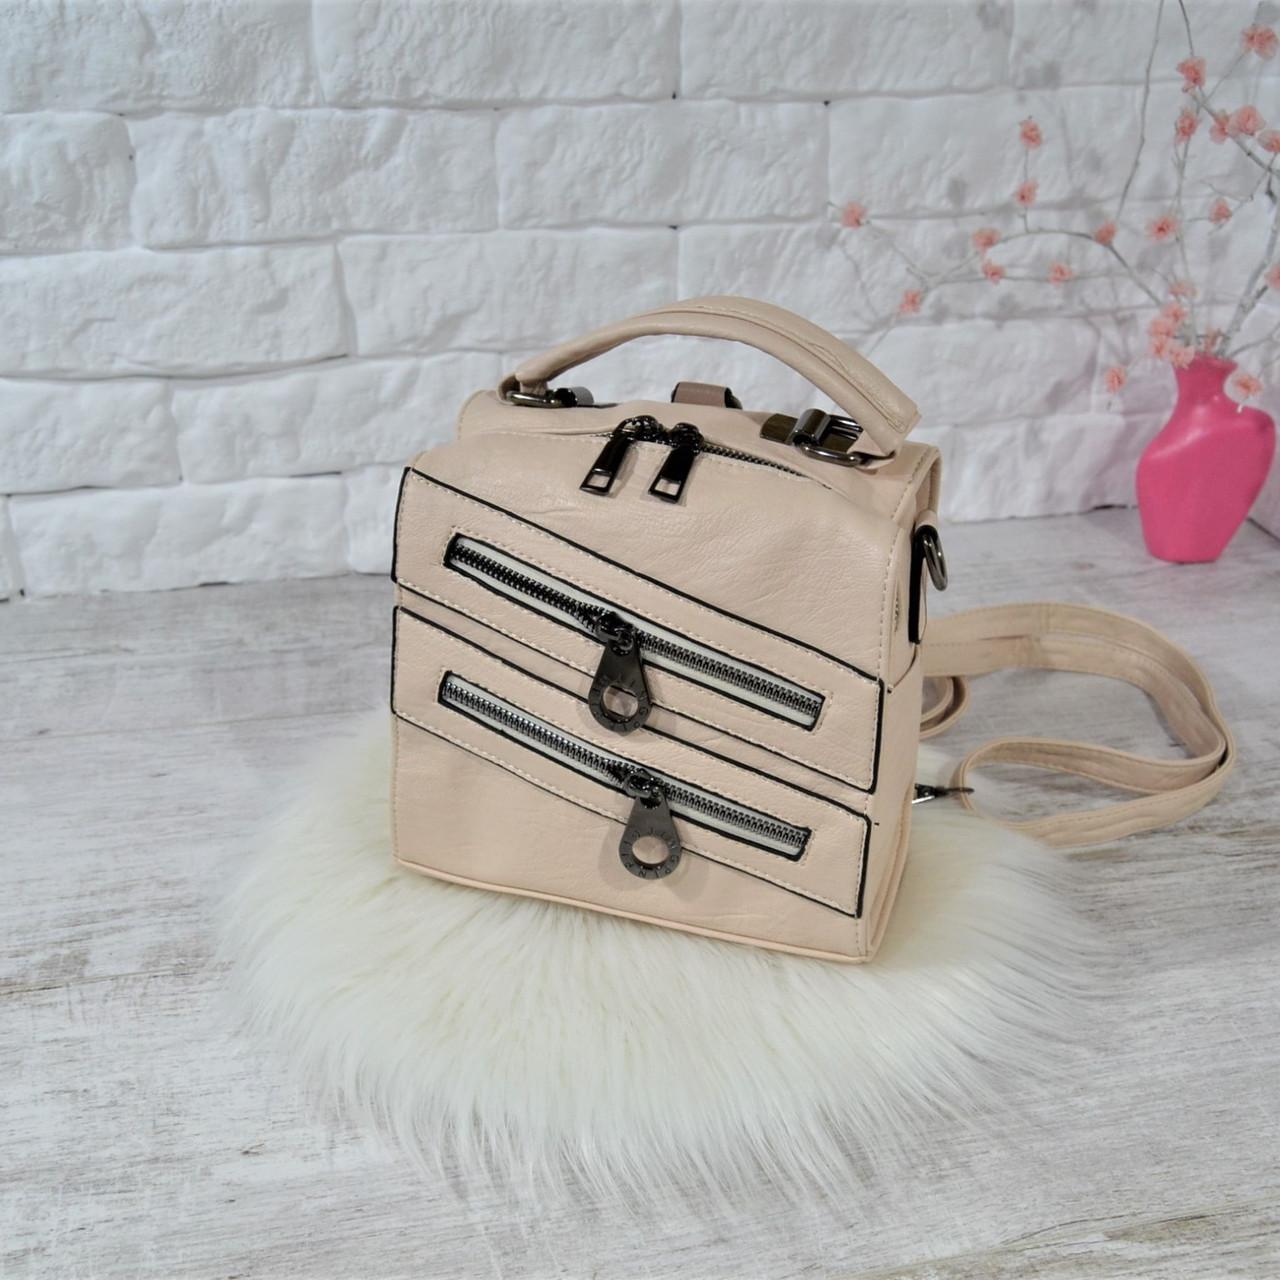 Сумка-рюкзак Молния Компакт городская бежевая